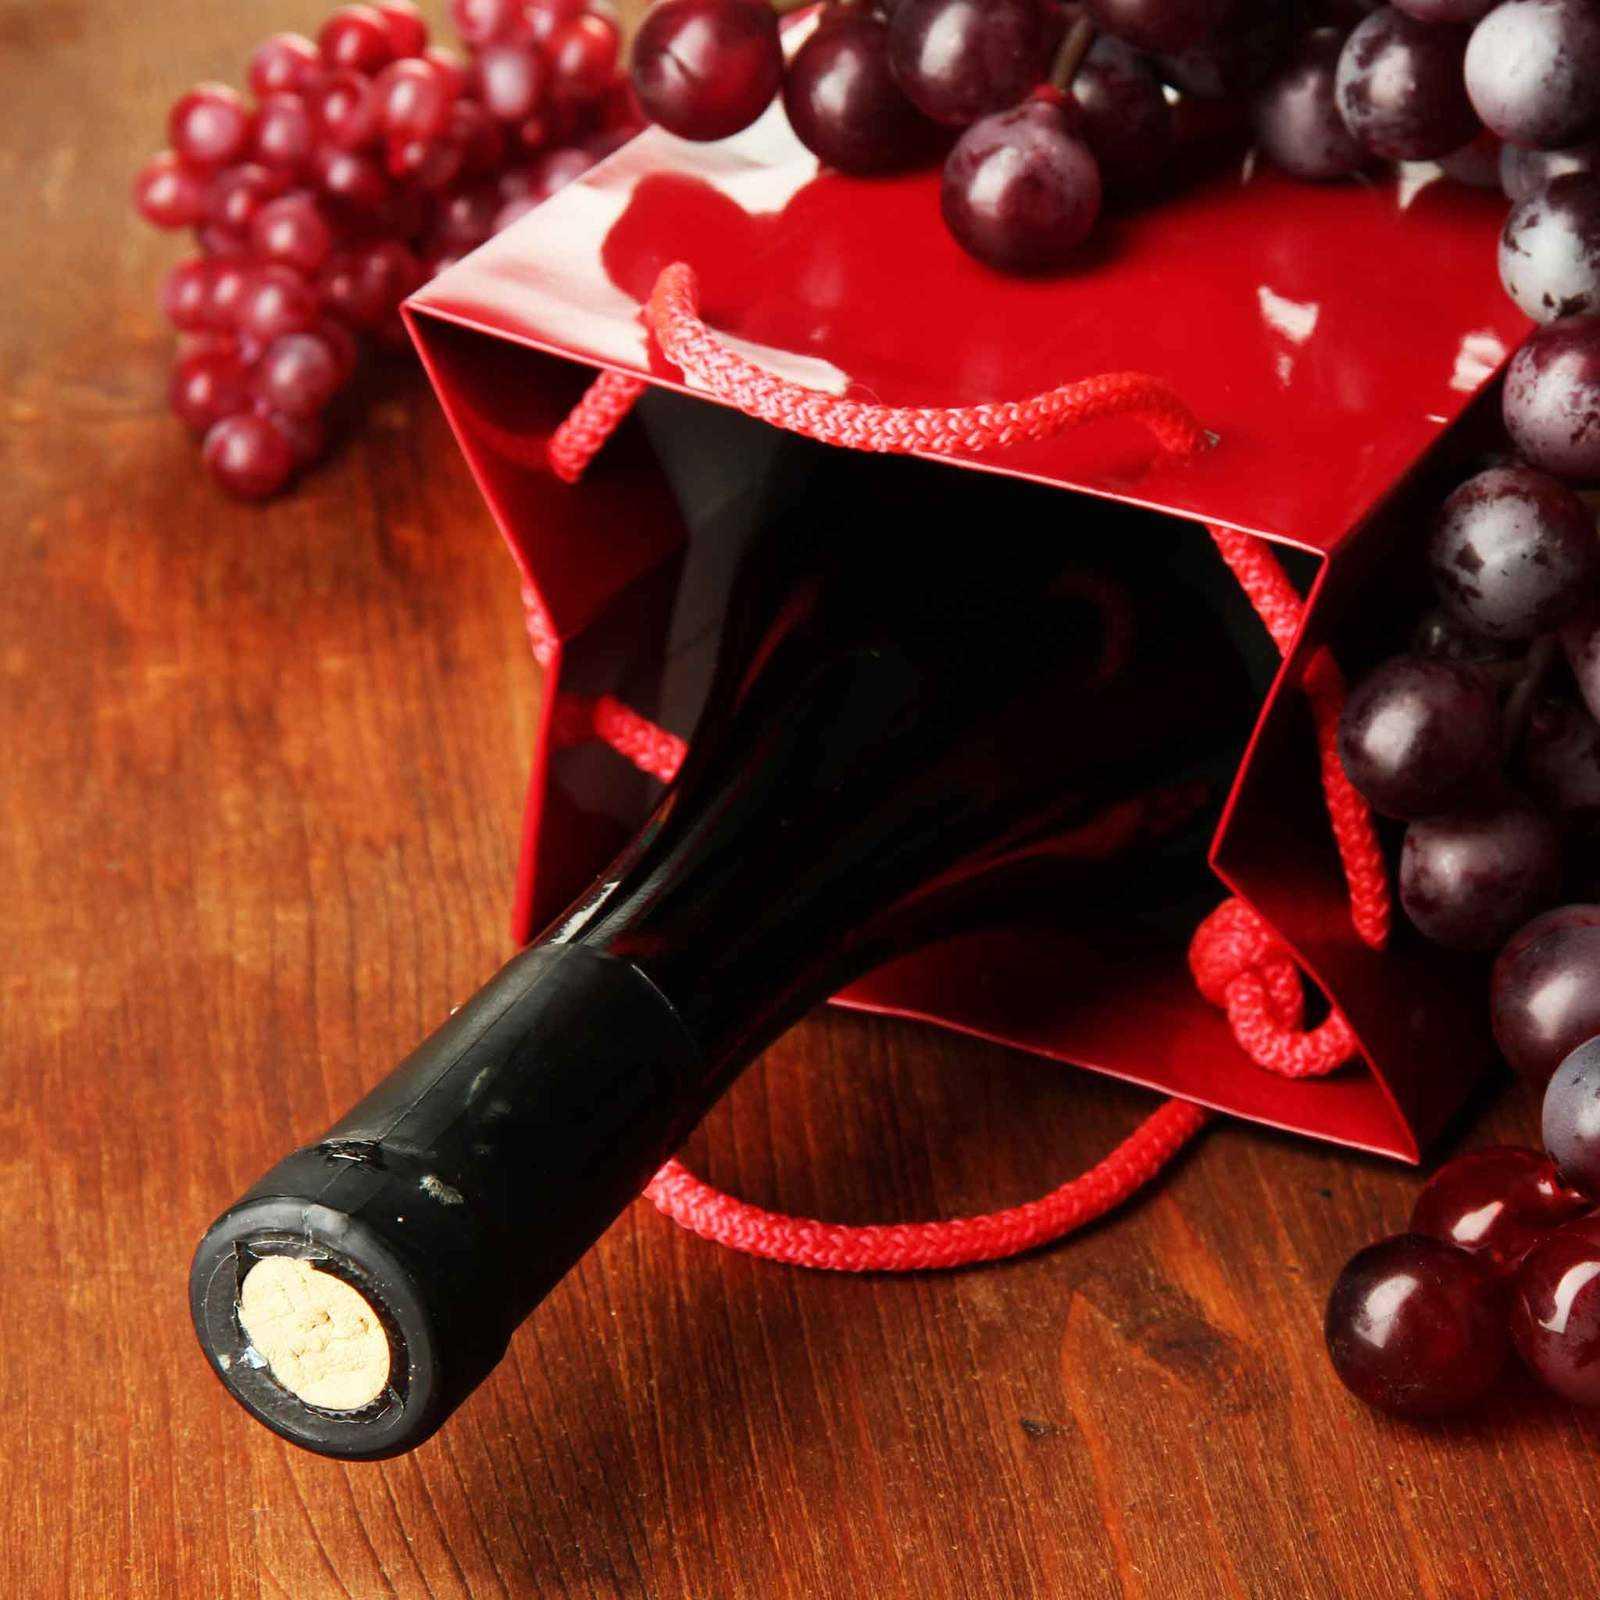 Engraved Wine Bottle in a Gift Bag